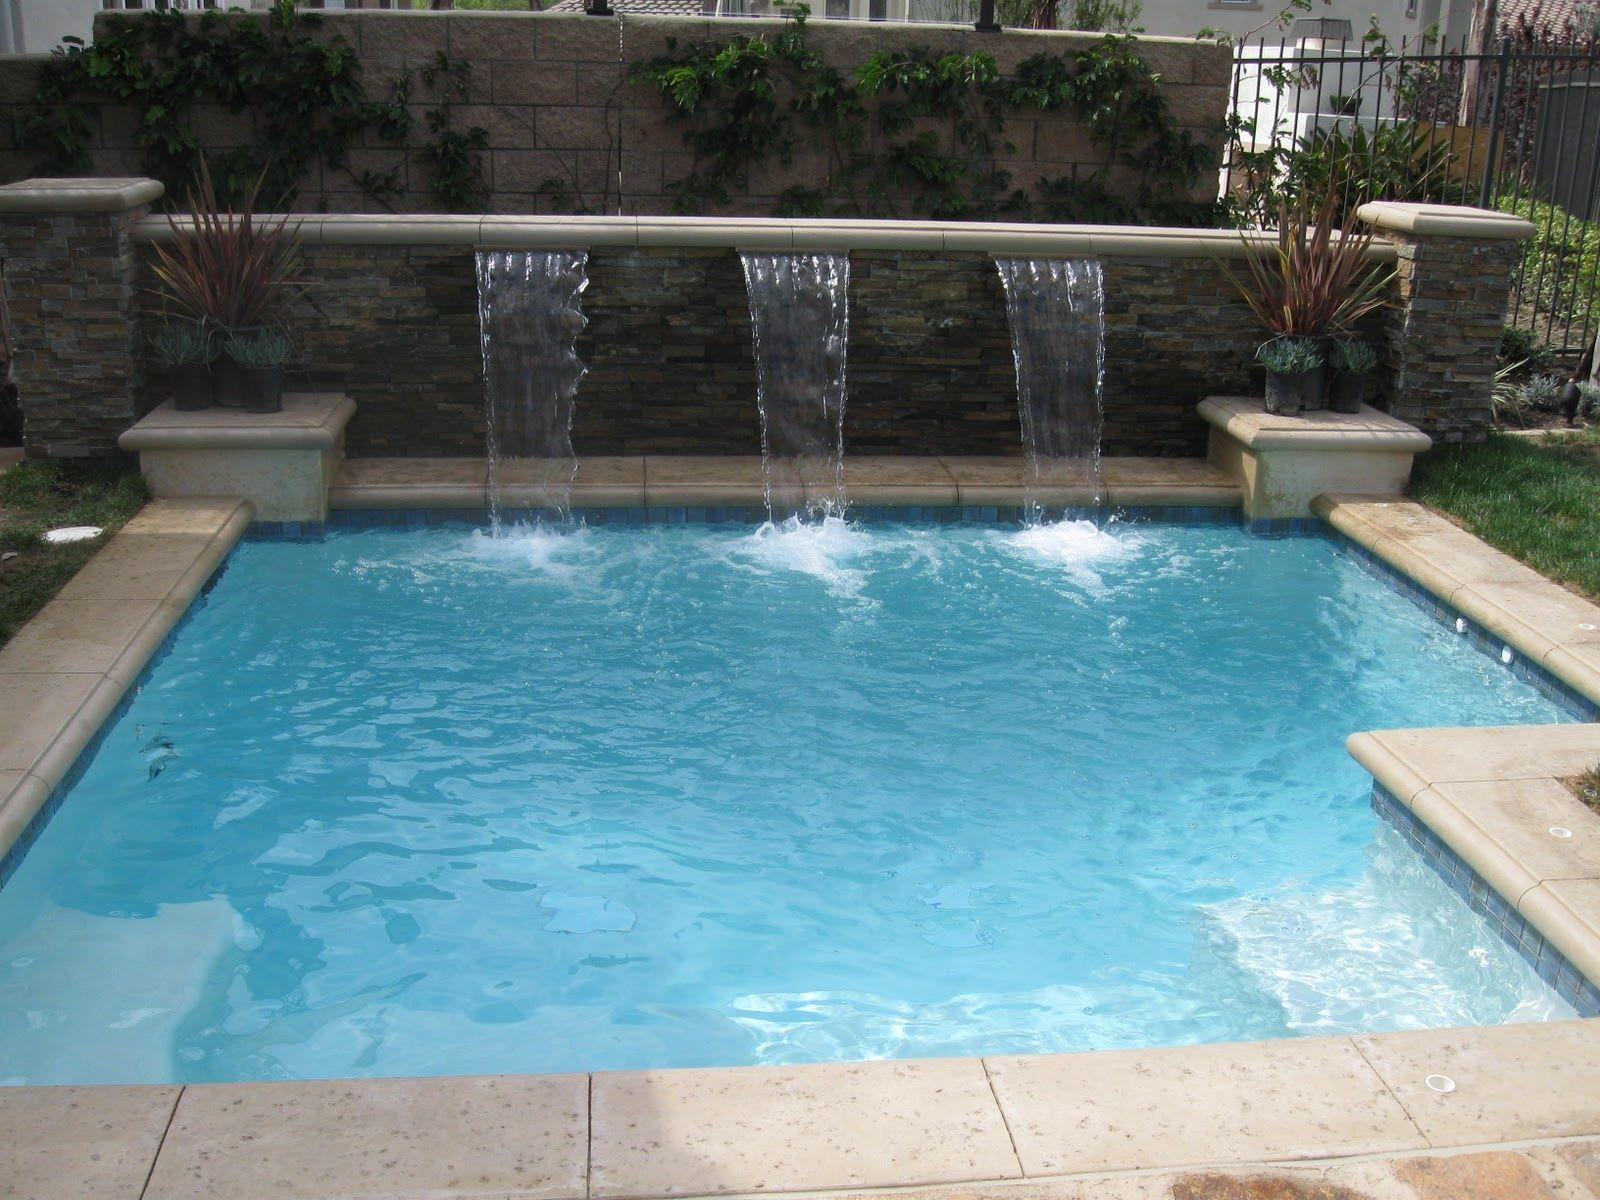 Spool Like The Back Wall Amazing Swimming Pools Small Swimming Pools Backyard Pool